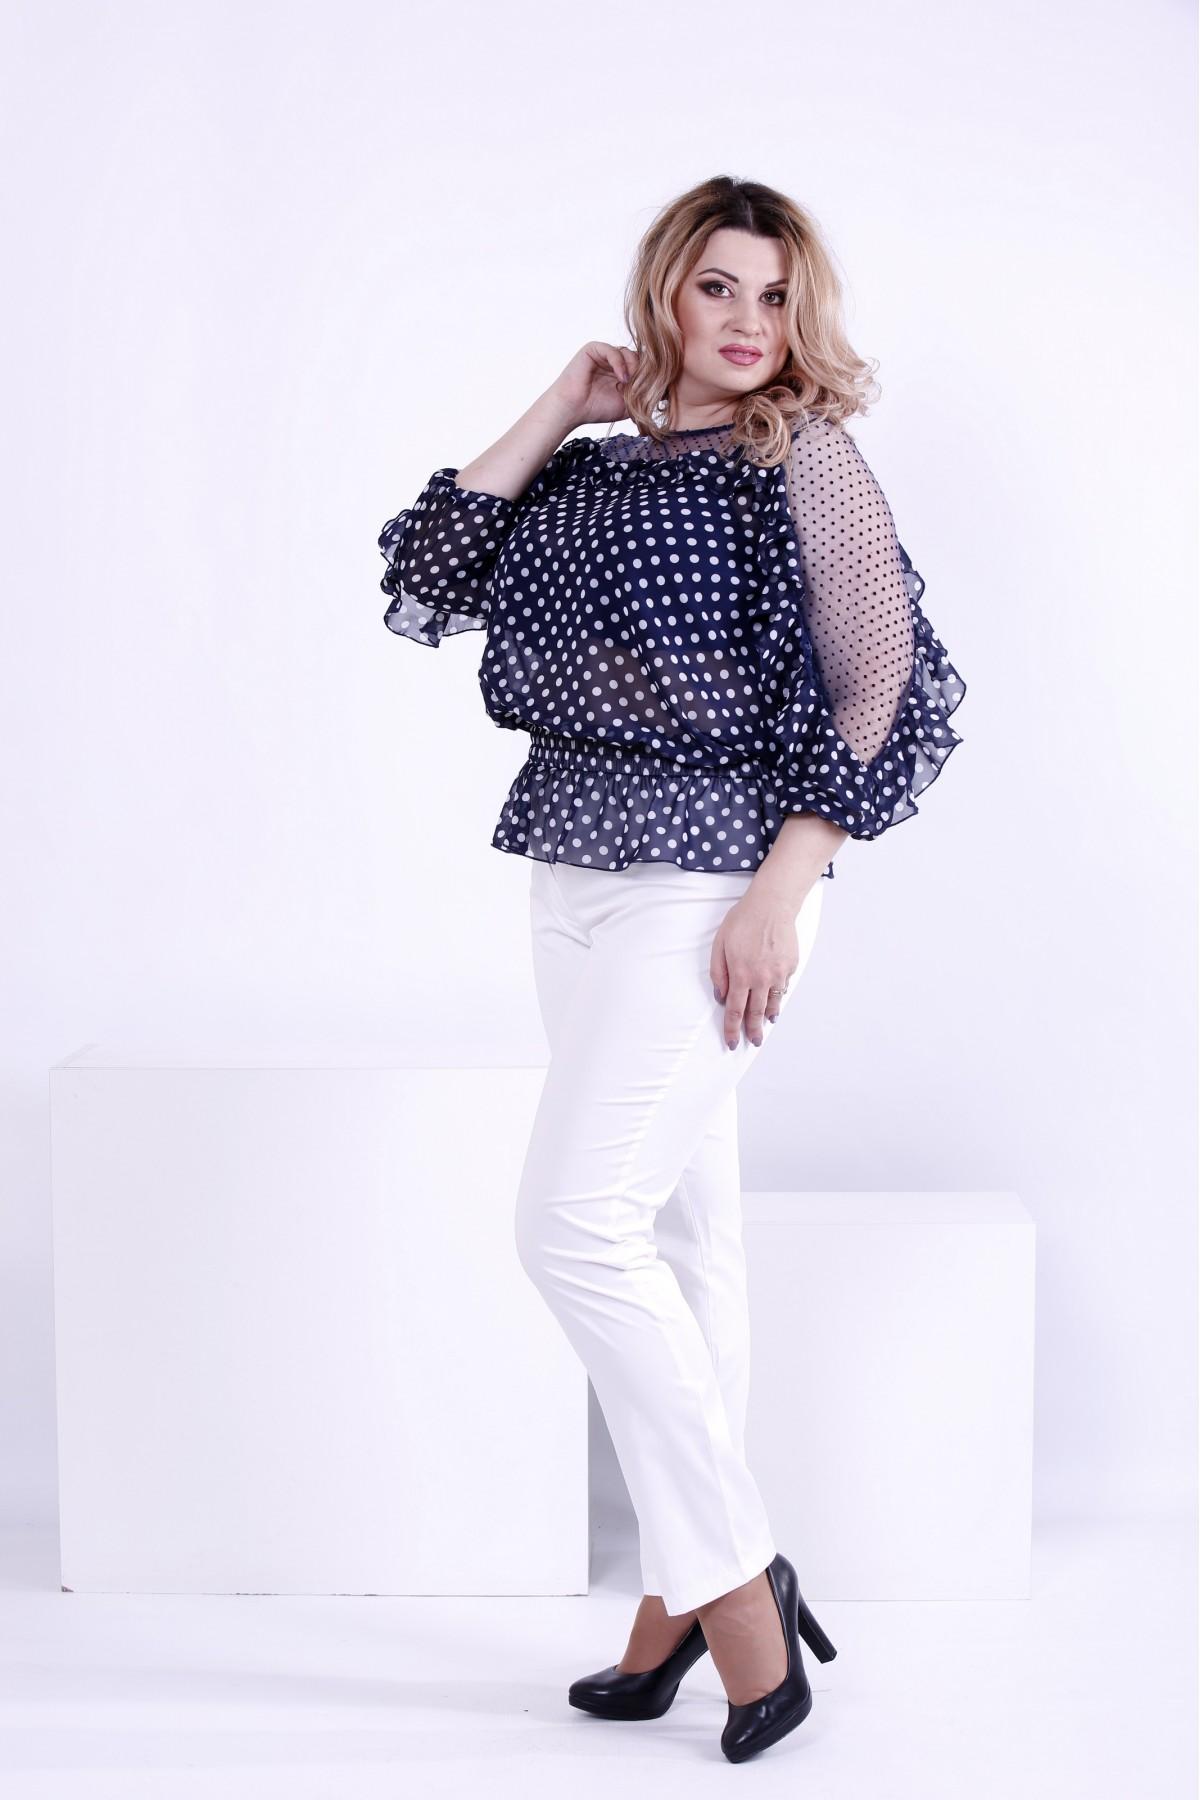 bb1f6f15dd4 ... Фото Синяя блузка в горох с сеткой